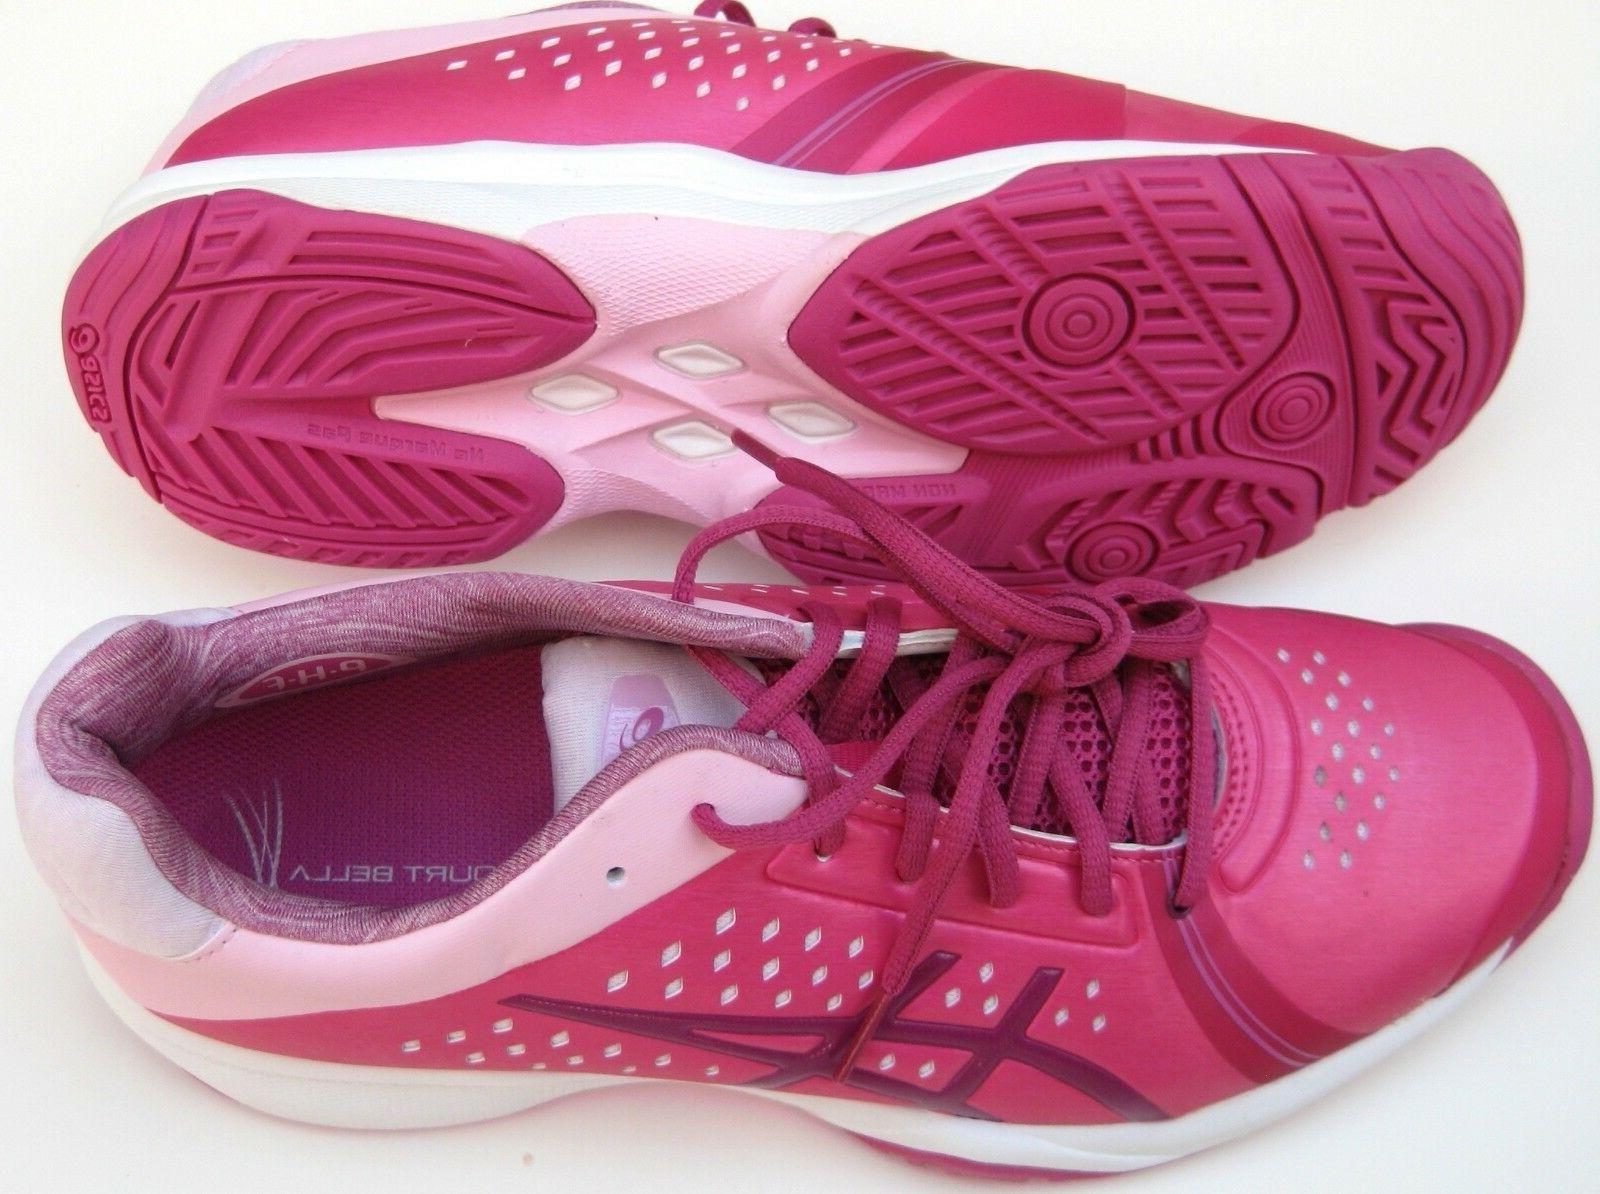 New Asics Gel-Court Bella Women's Tennis Shoes E655Y Size 7.